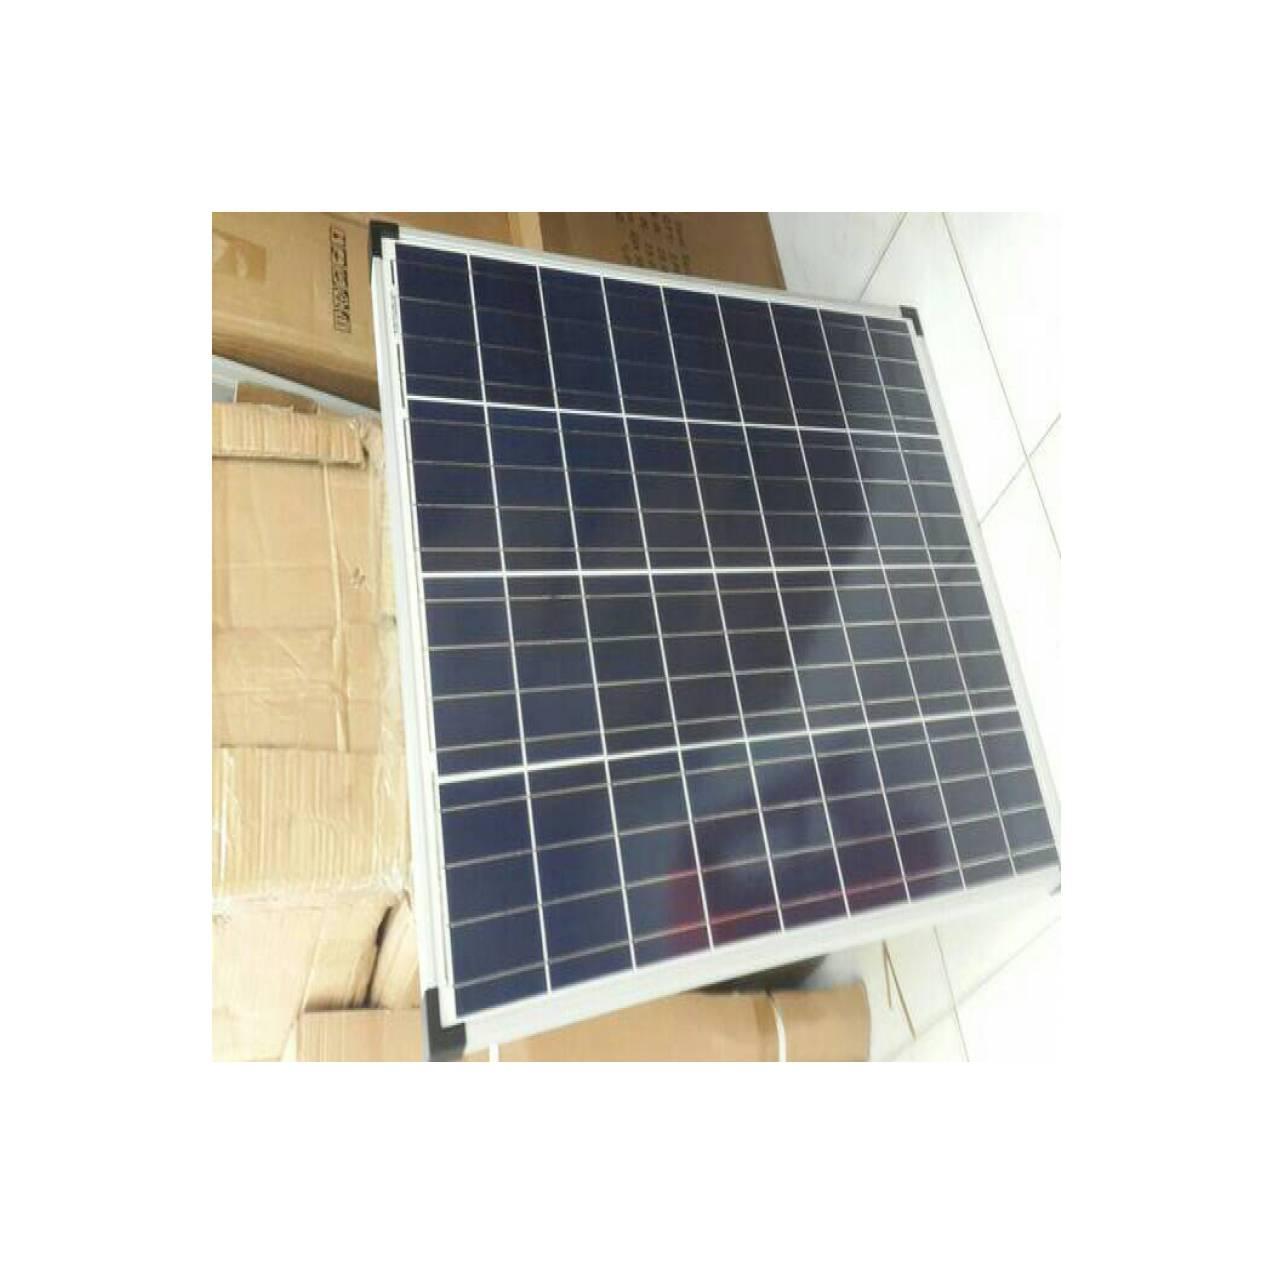 Harga Promo Solar Panel / Solar Cell / Panel Surya Dekade 100 wp Poly